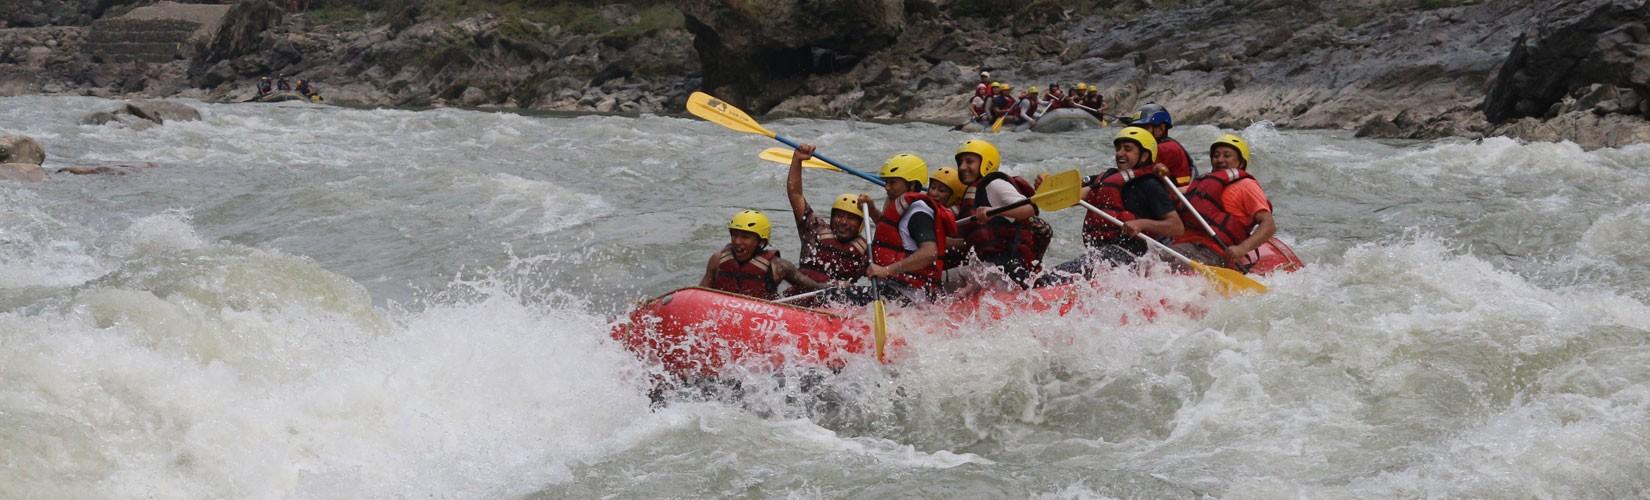 River Rafting in Nepal